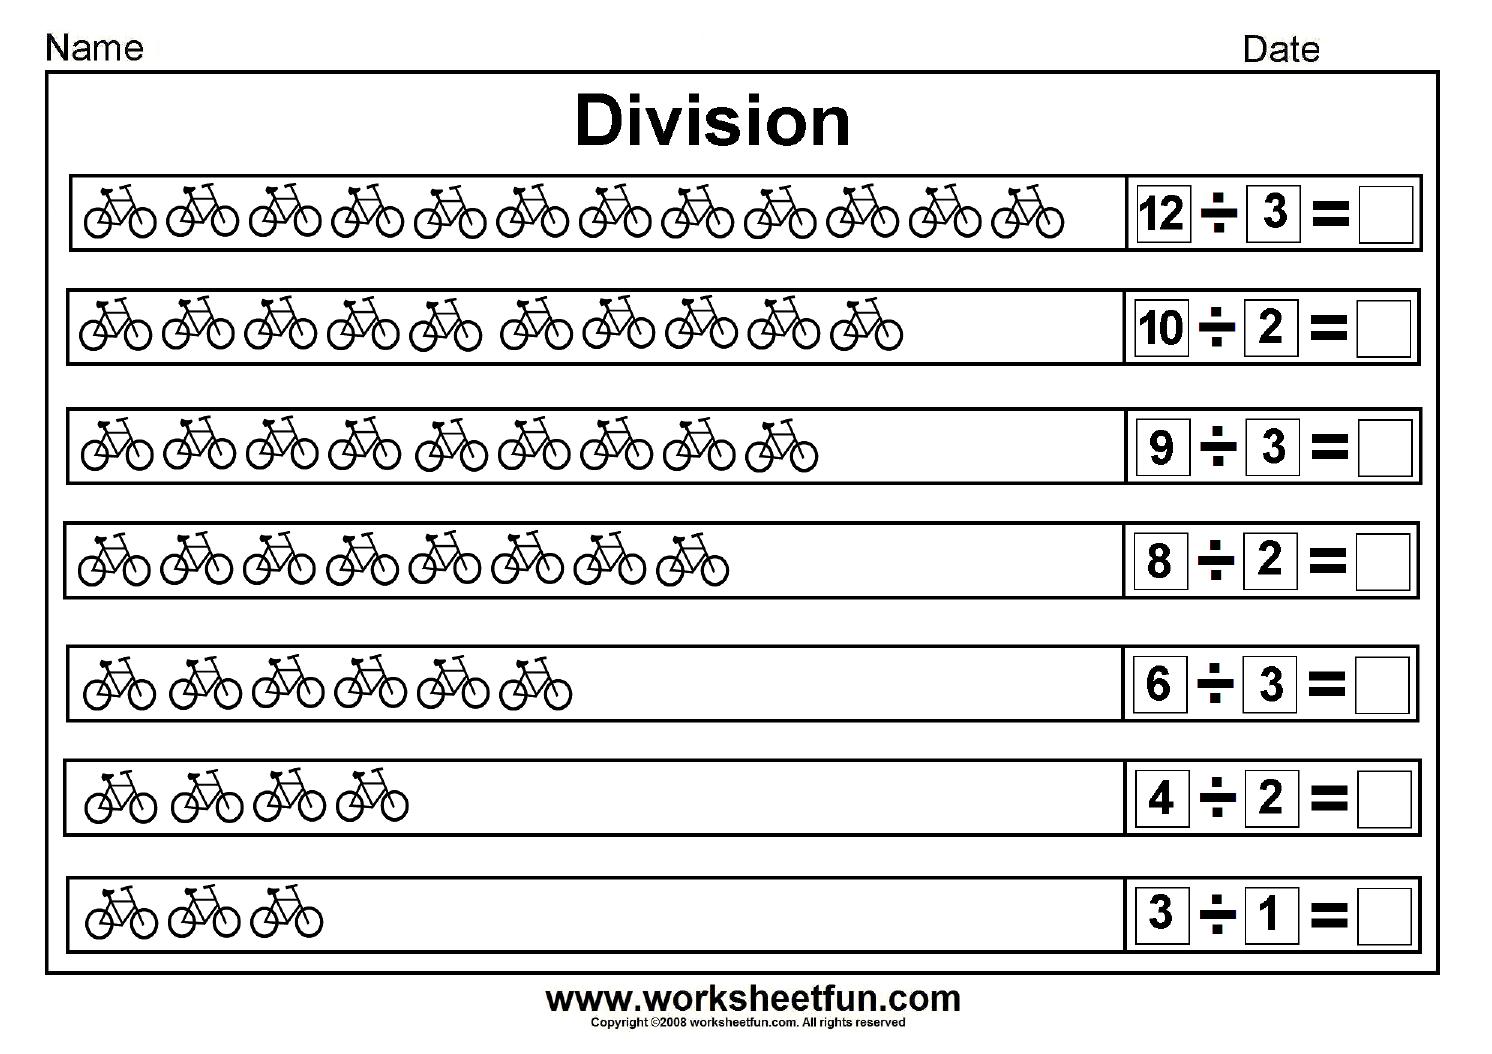 Division worksheets on worksheetfun.com   Division worksheets [ 1054 x 1492 Pixel ]